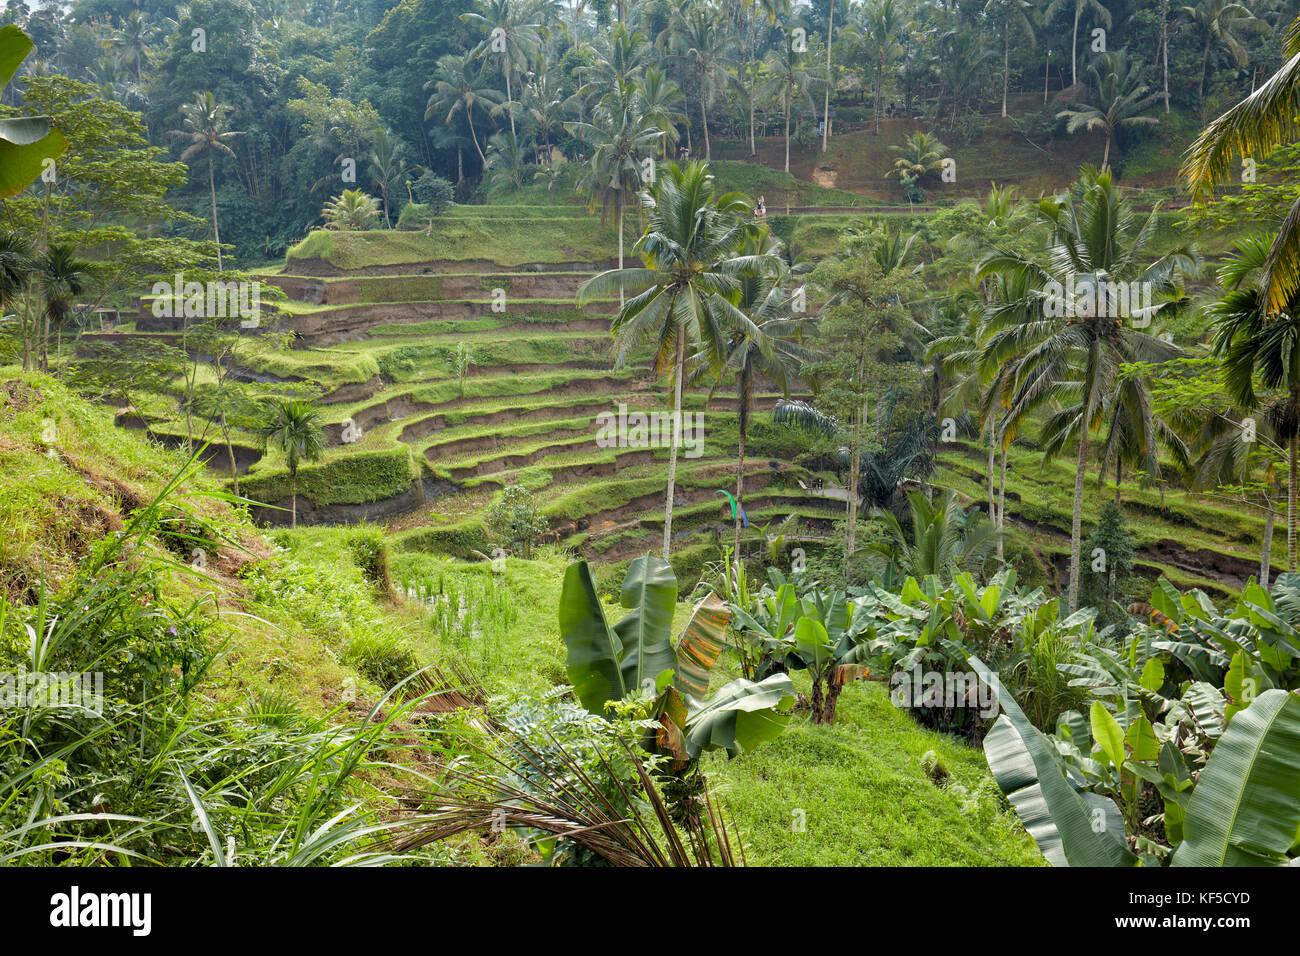 Tegalalang Terrasse de riz. Village de Tegalalang, Bali, Indonésie. Photo Stock